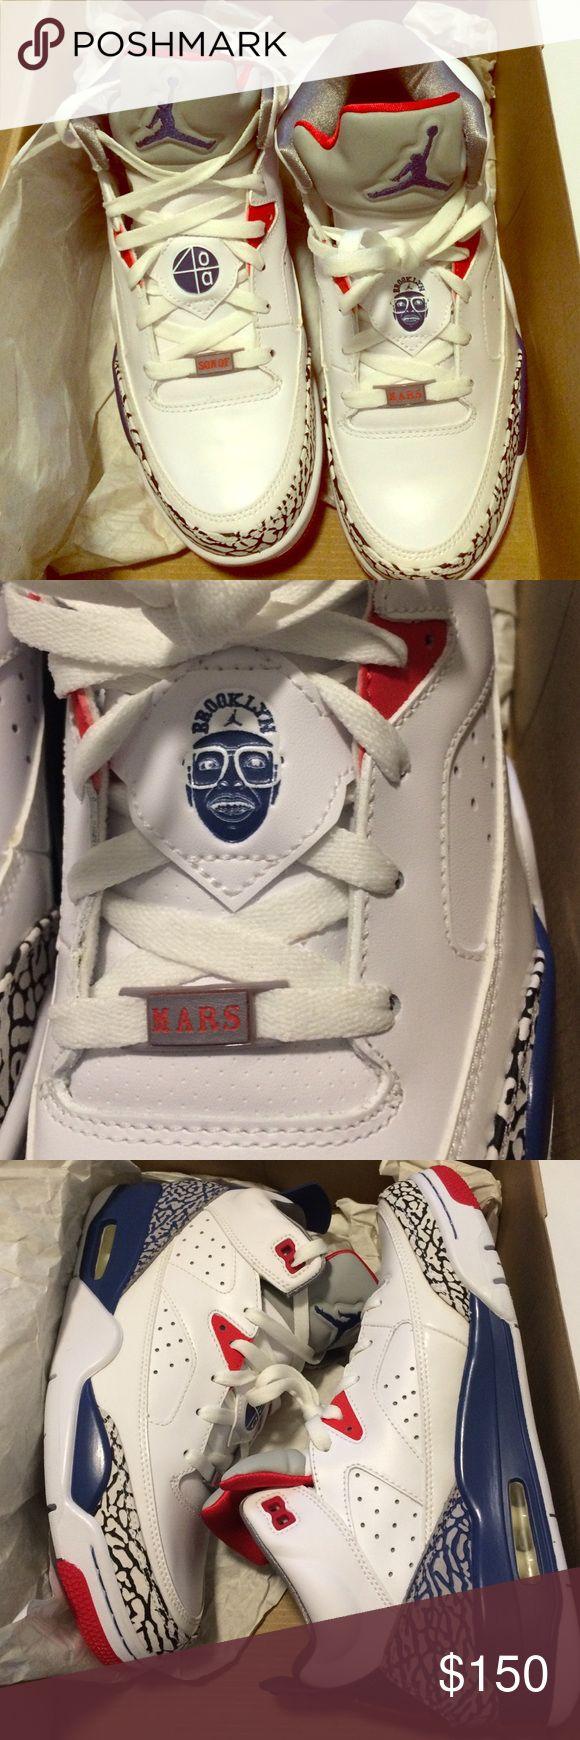 Jordan son of low sneakers mars spizike spike lee Men's size 8.5 new with  box Nike